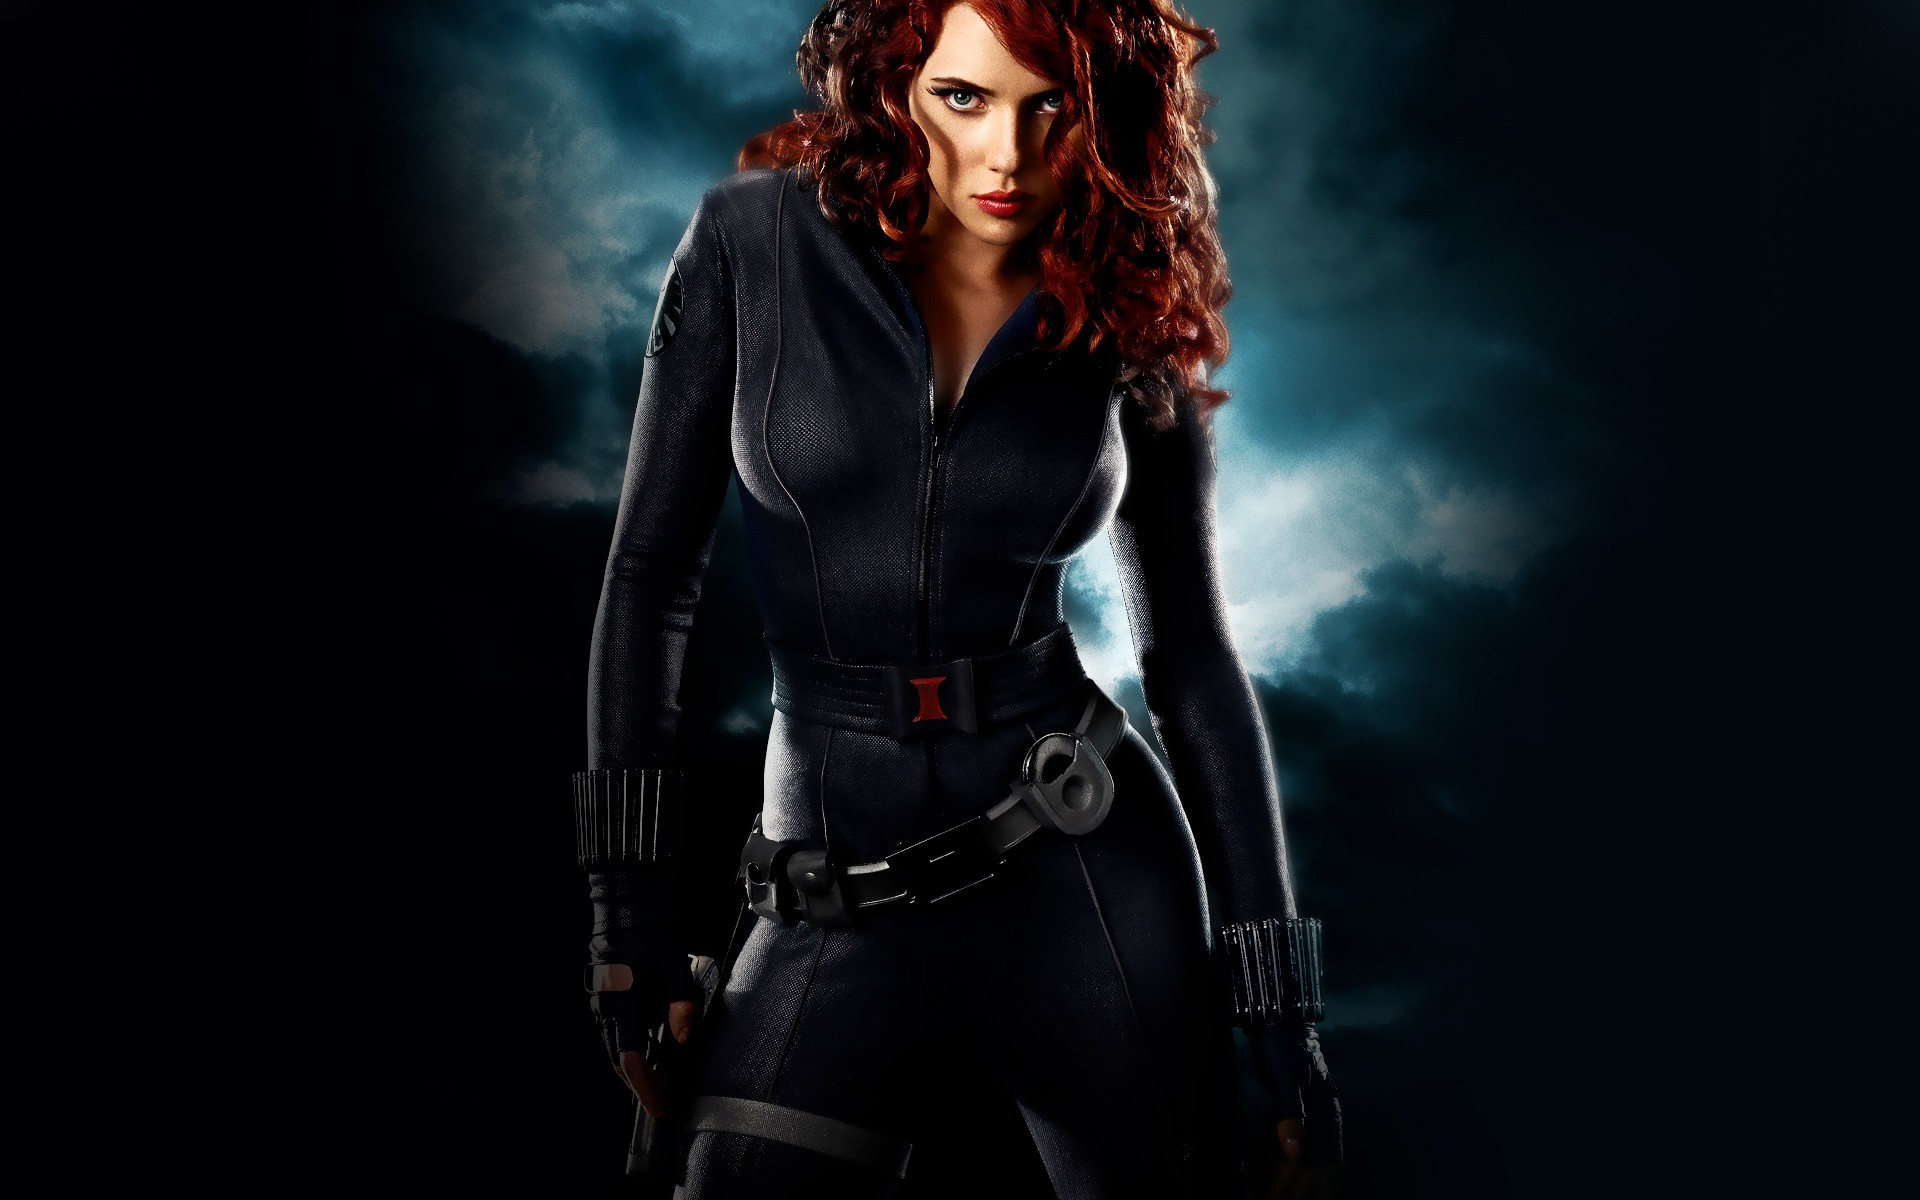 Black Widow Wallpapers Scarlett Johansson Wallpapersafari